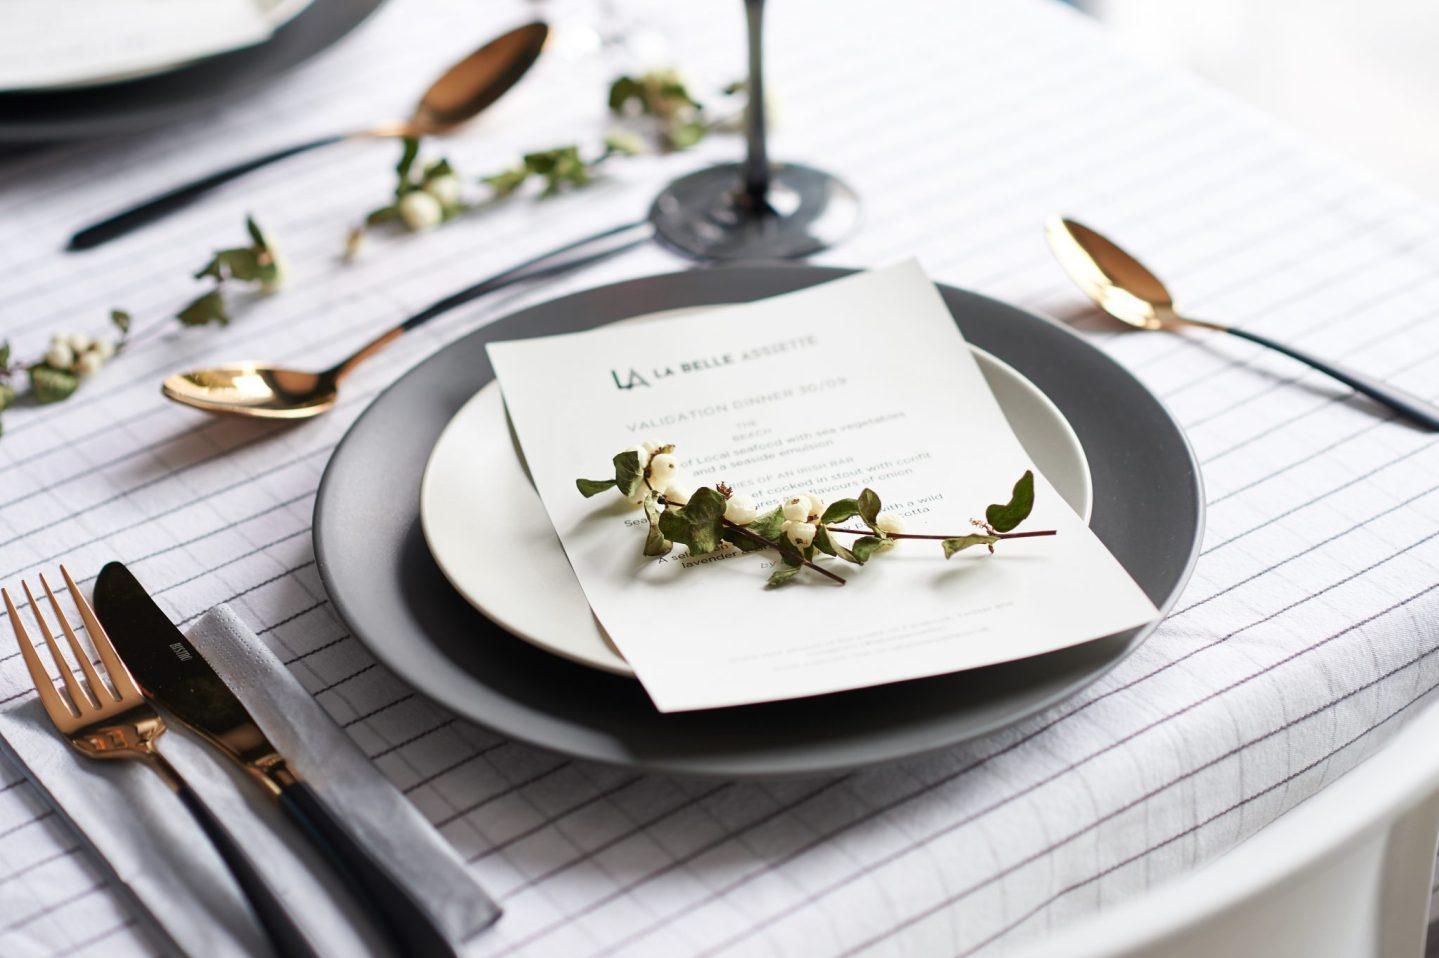 La Belle Assiette, Private Chef | The Halcyon Years